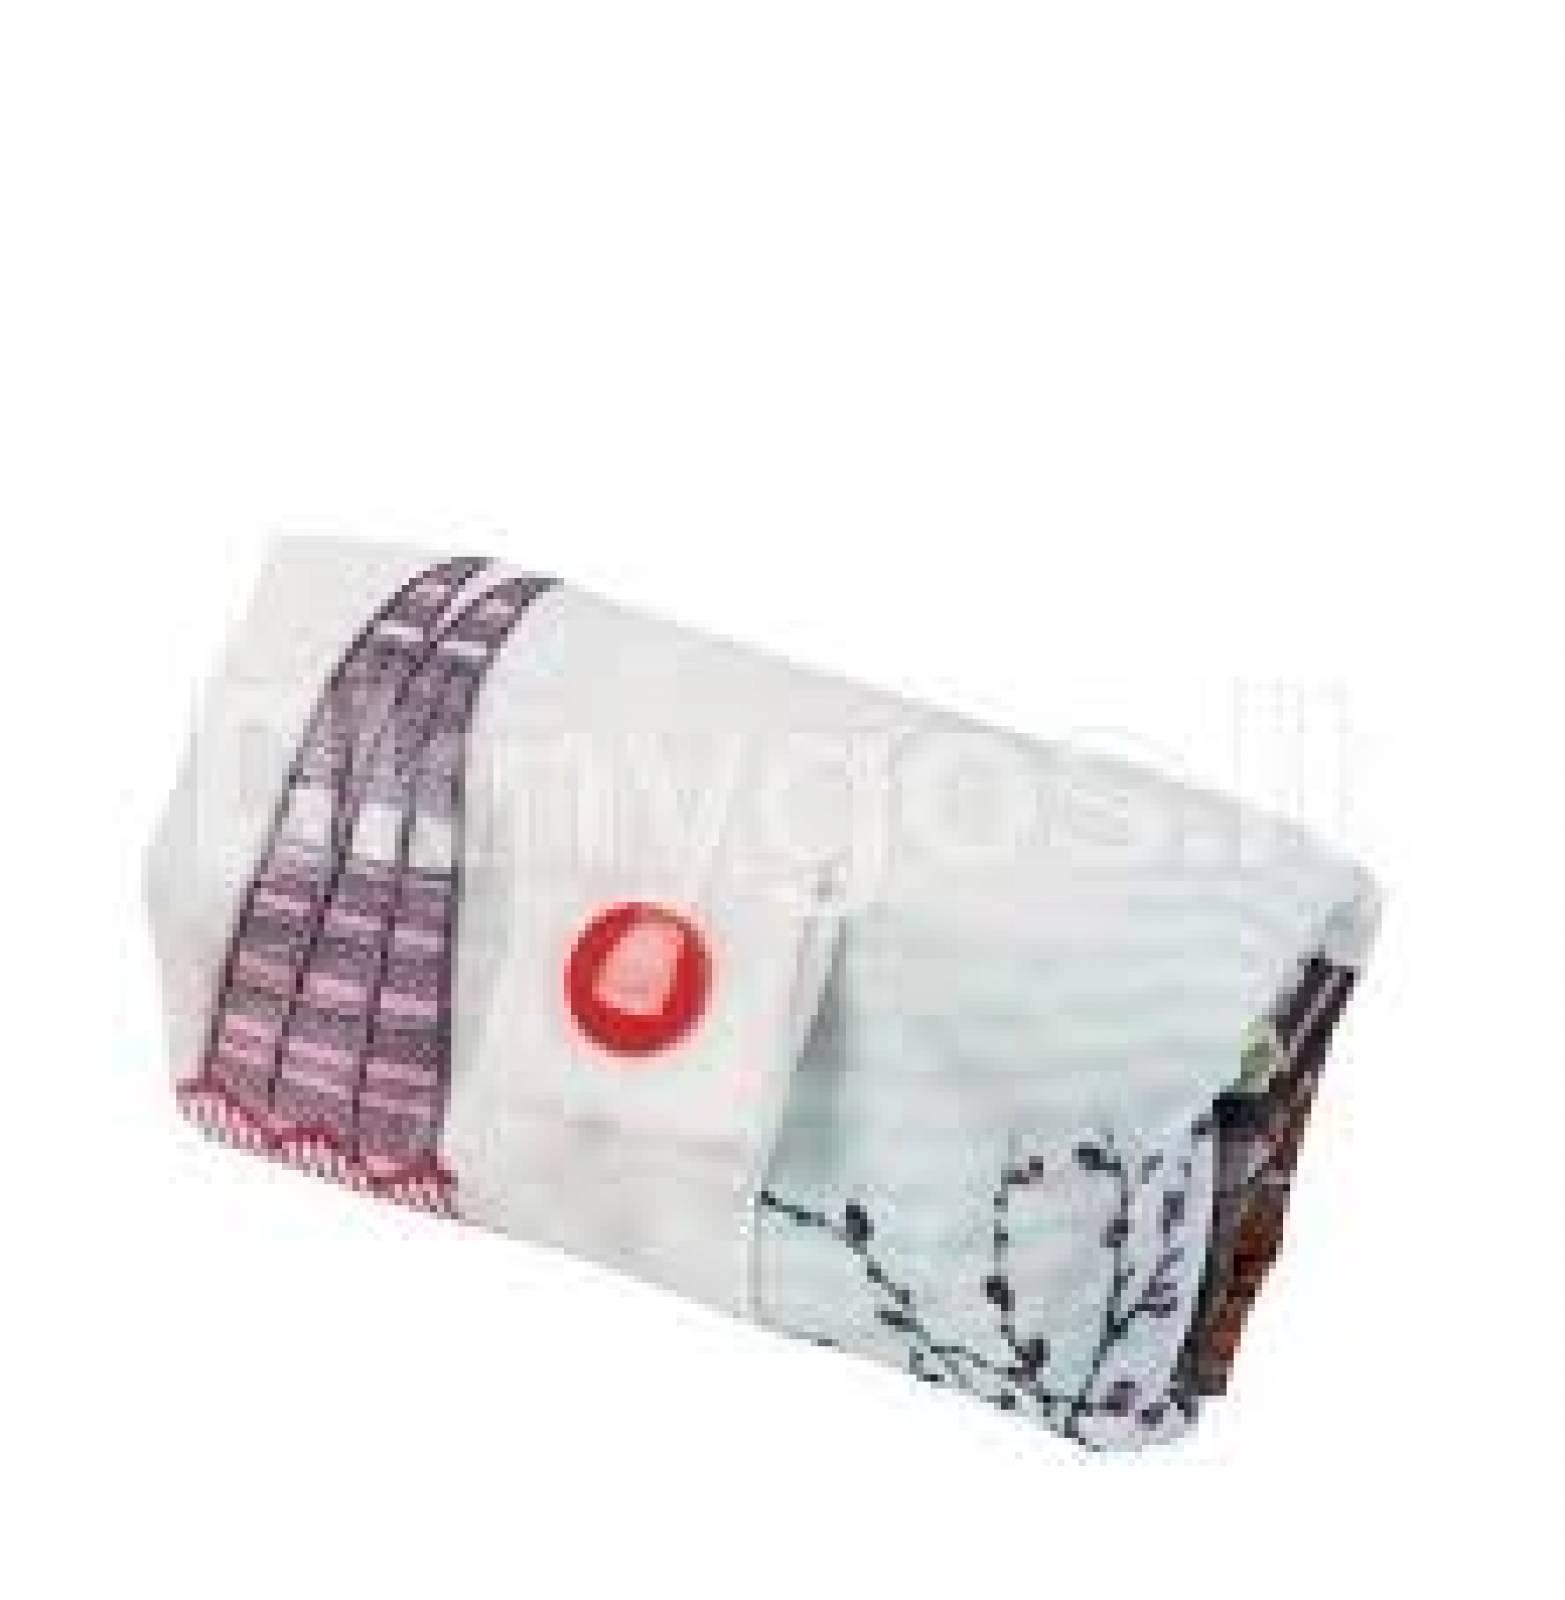 KRISTJANA S WILLIAMS London - Reusable Tote Bag With Pouch thumbnails